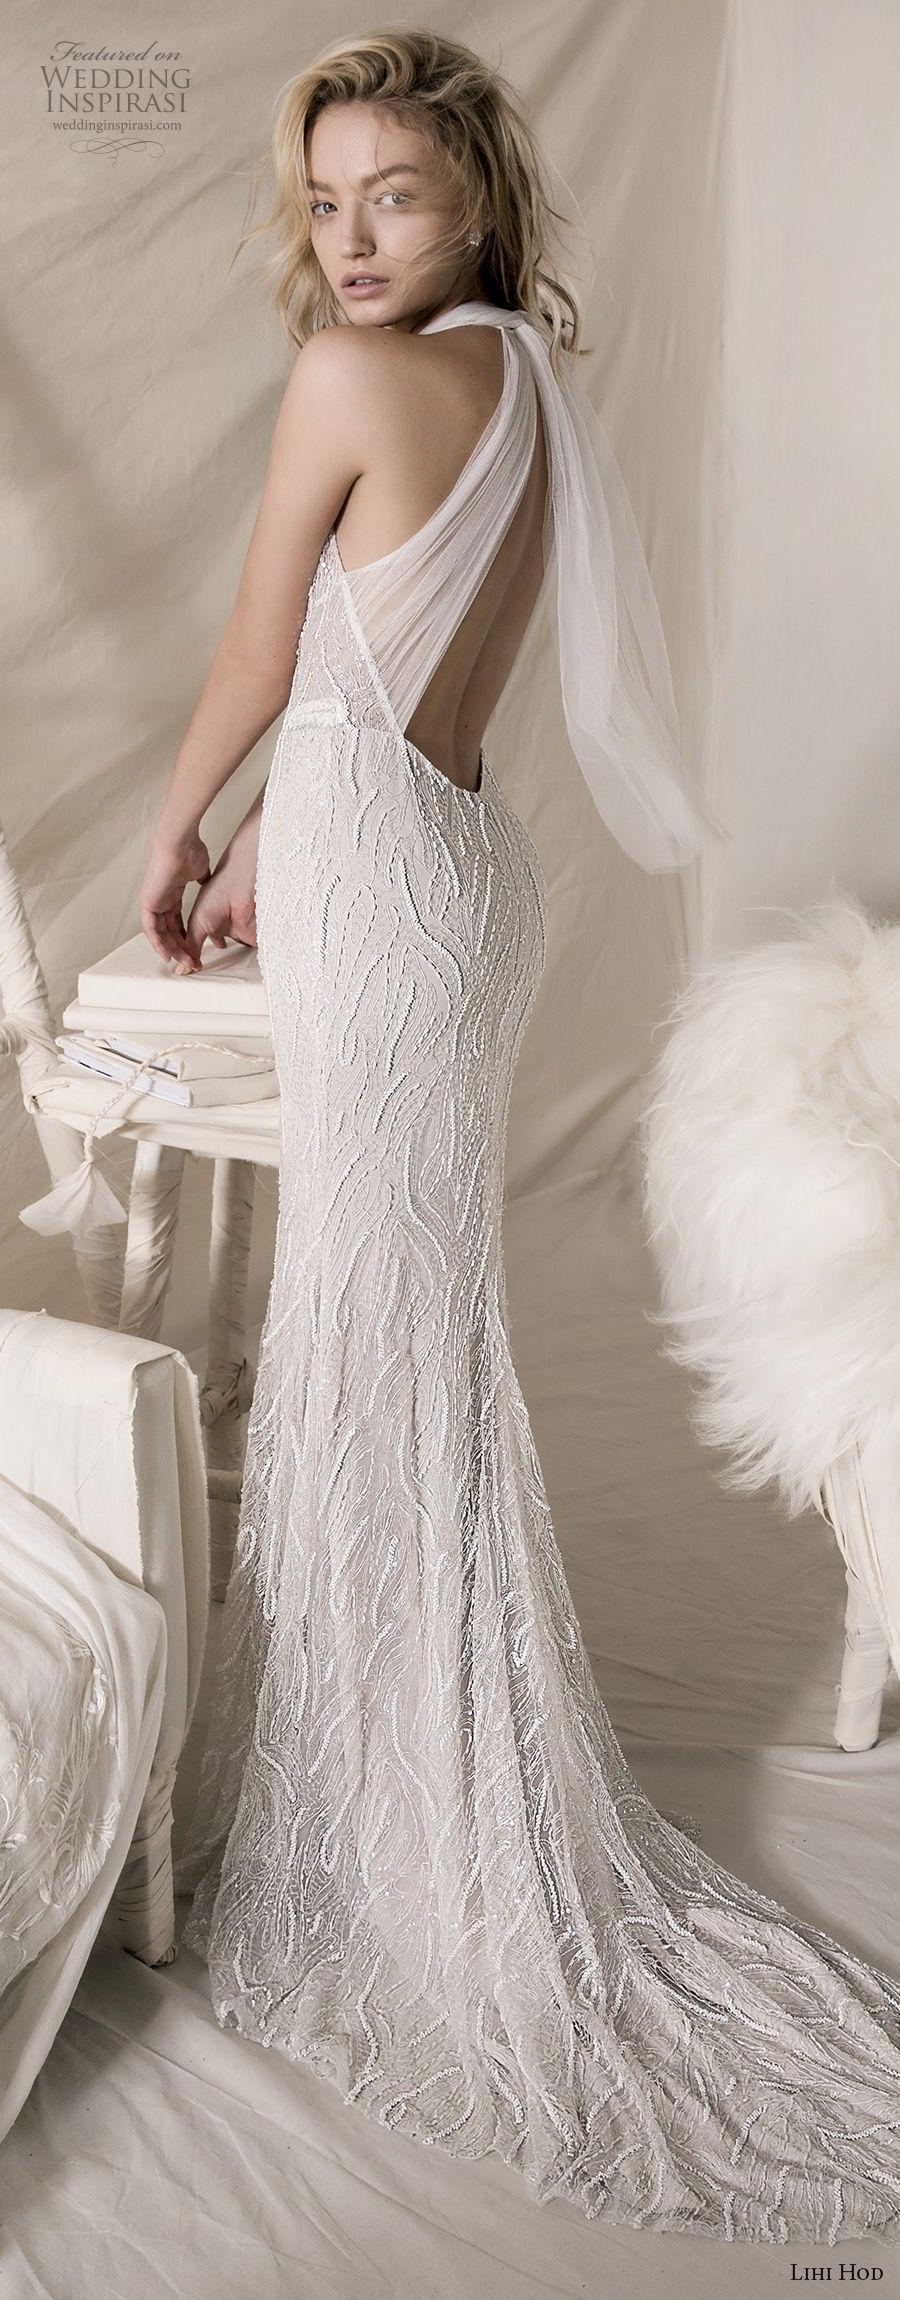 lihi hod 2018 bridal sleeveless halter jewel neck full embellishment elegant sheath wedding dress keyhole back sweep train (11) bv